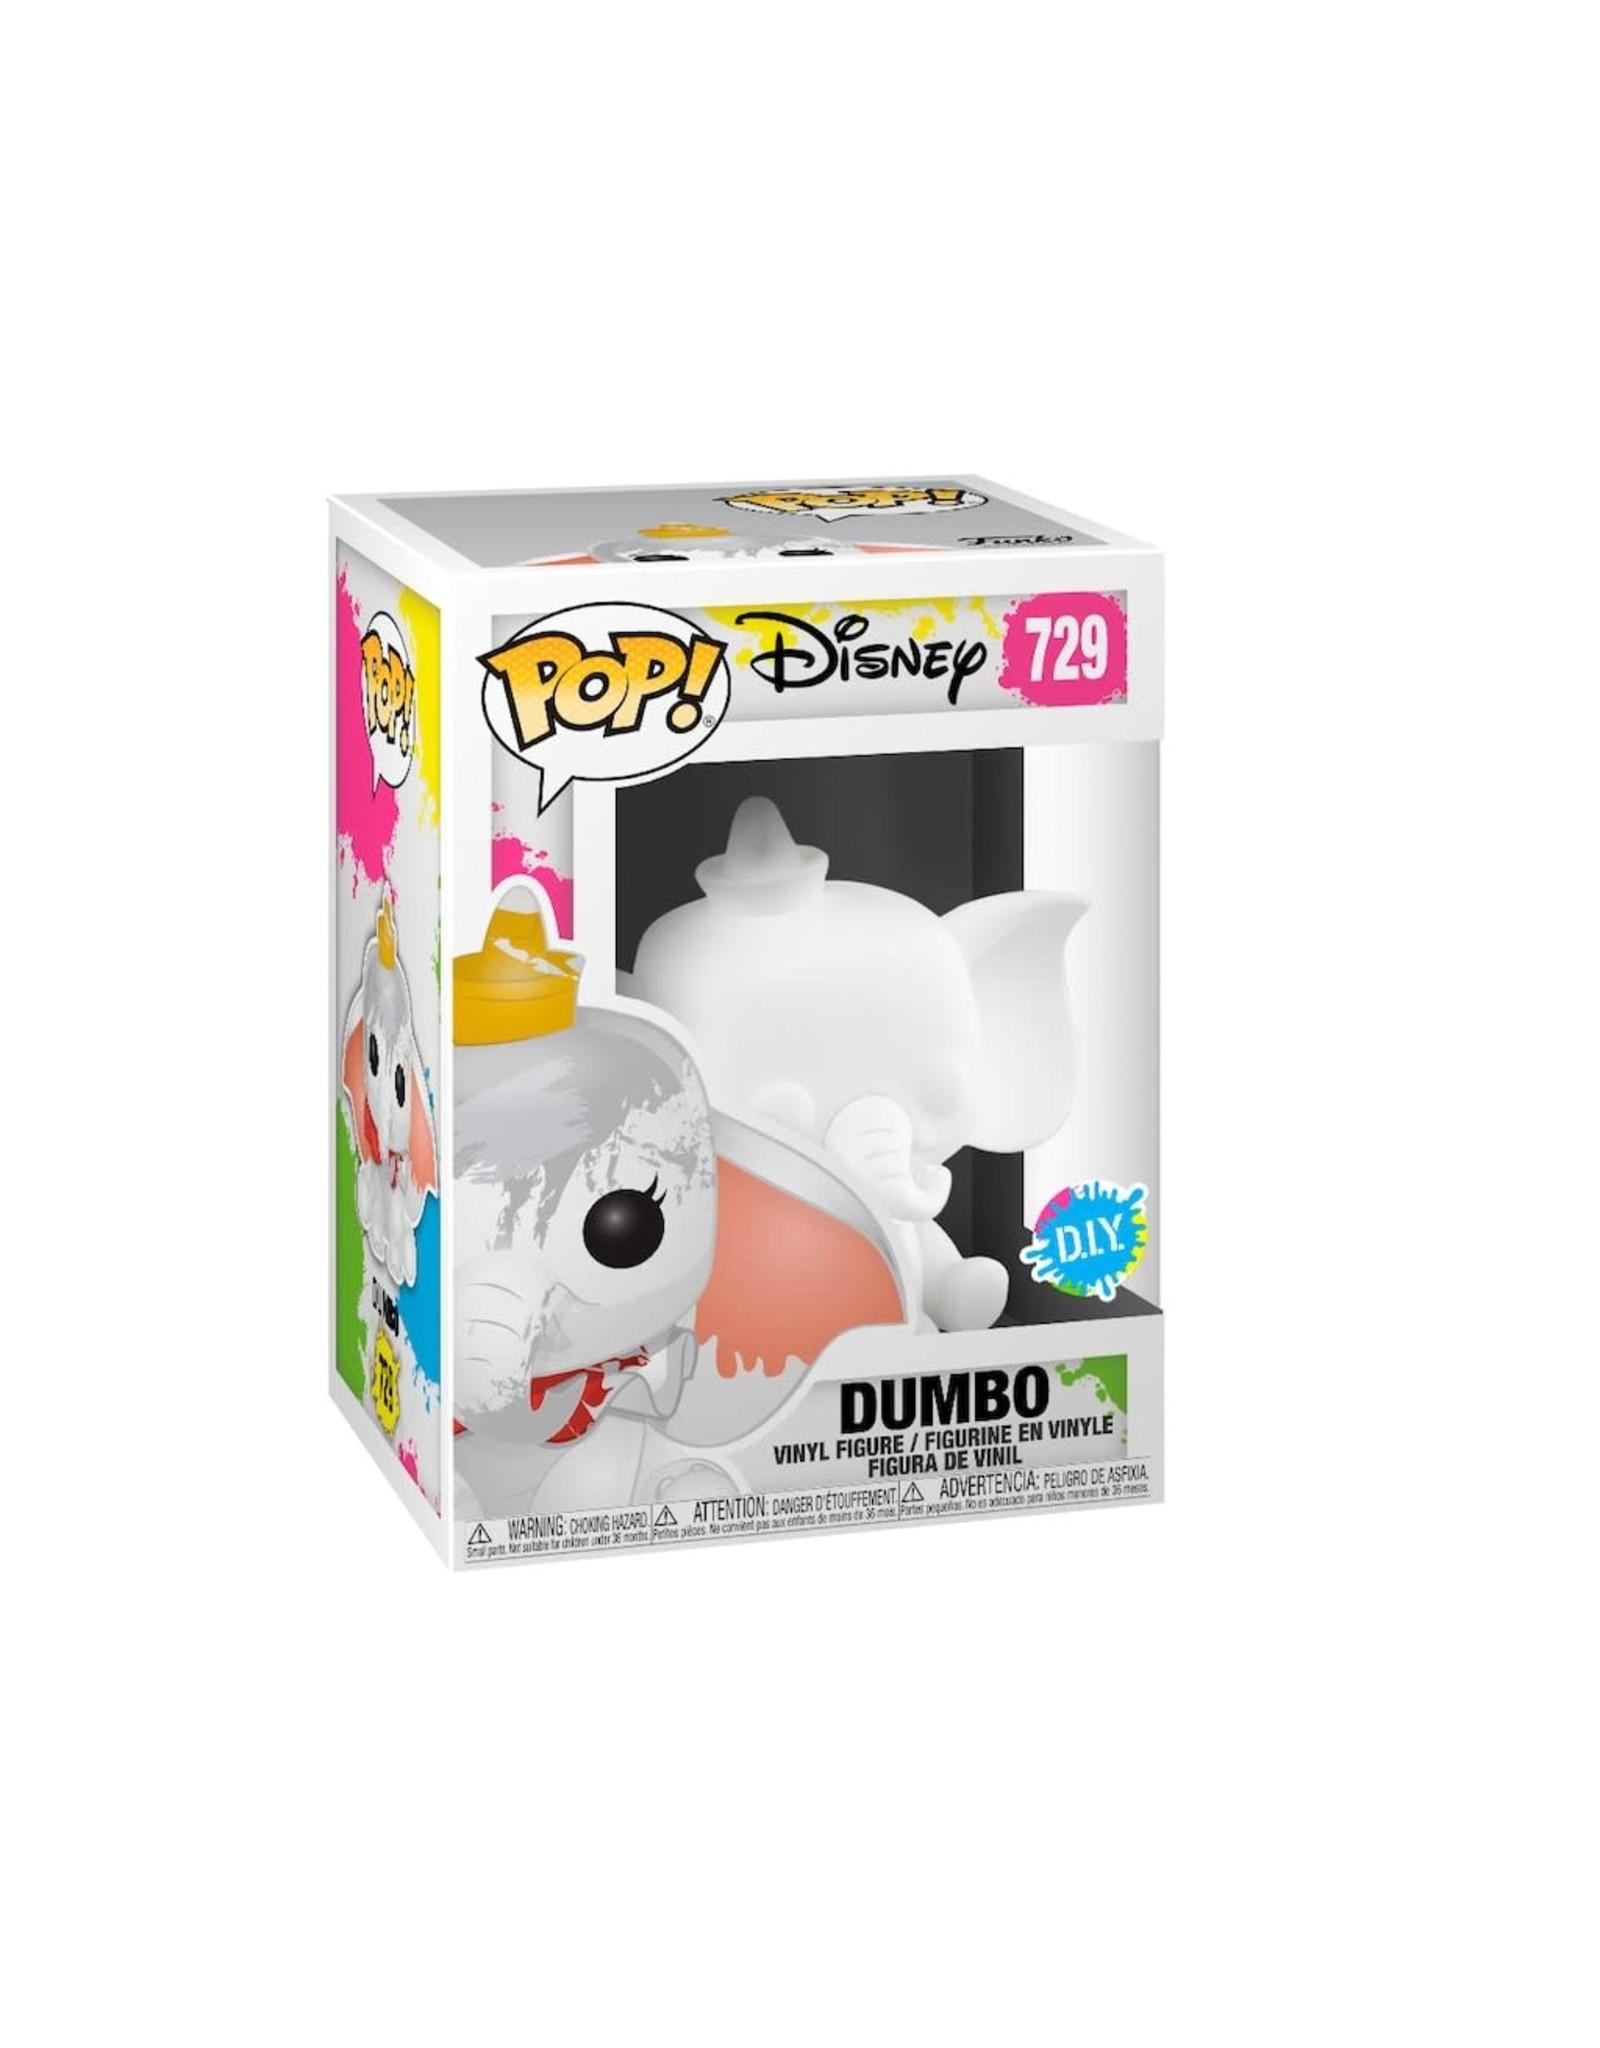 FUNKO POP DISNEY DIY DUMBO VINYL FIG